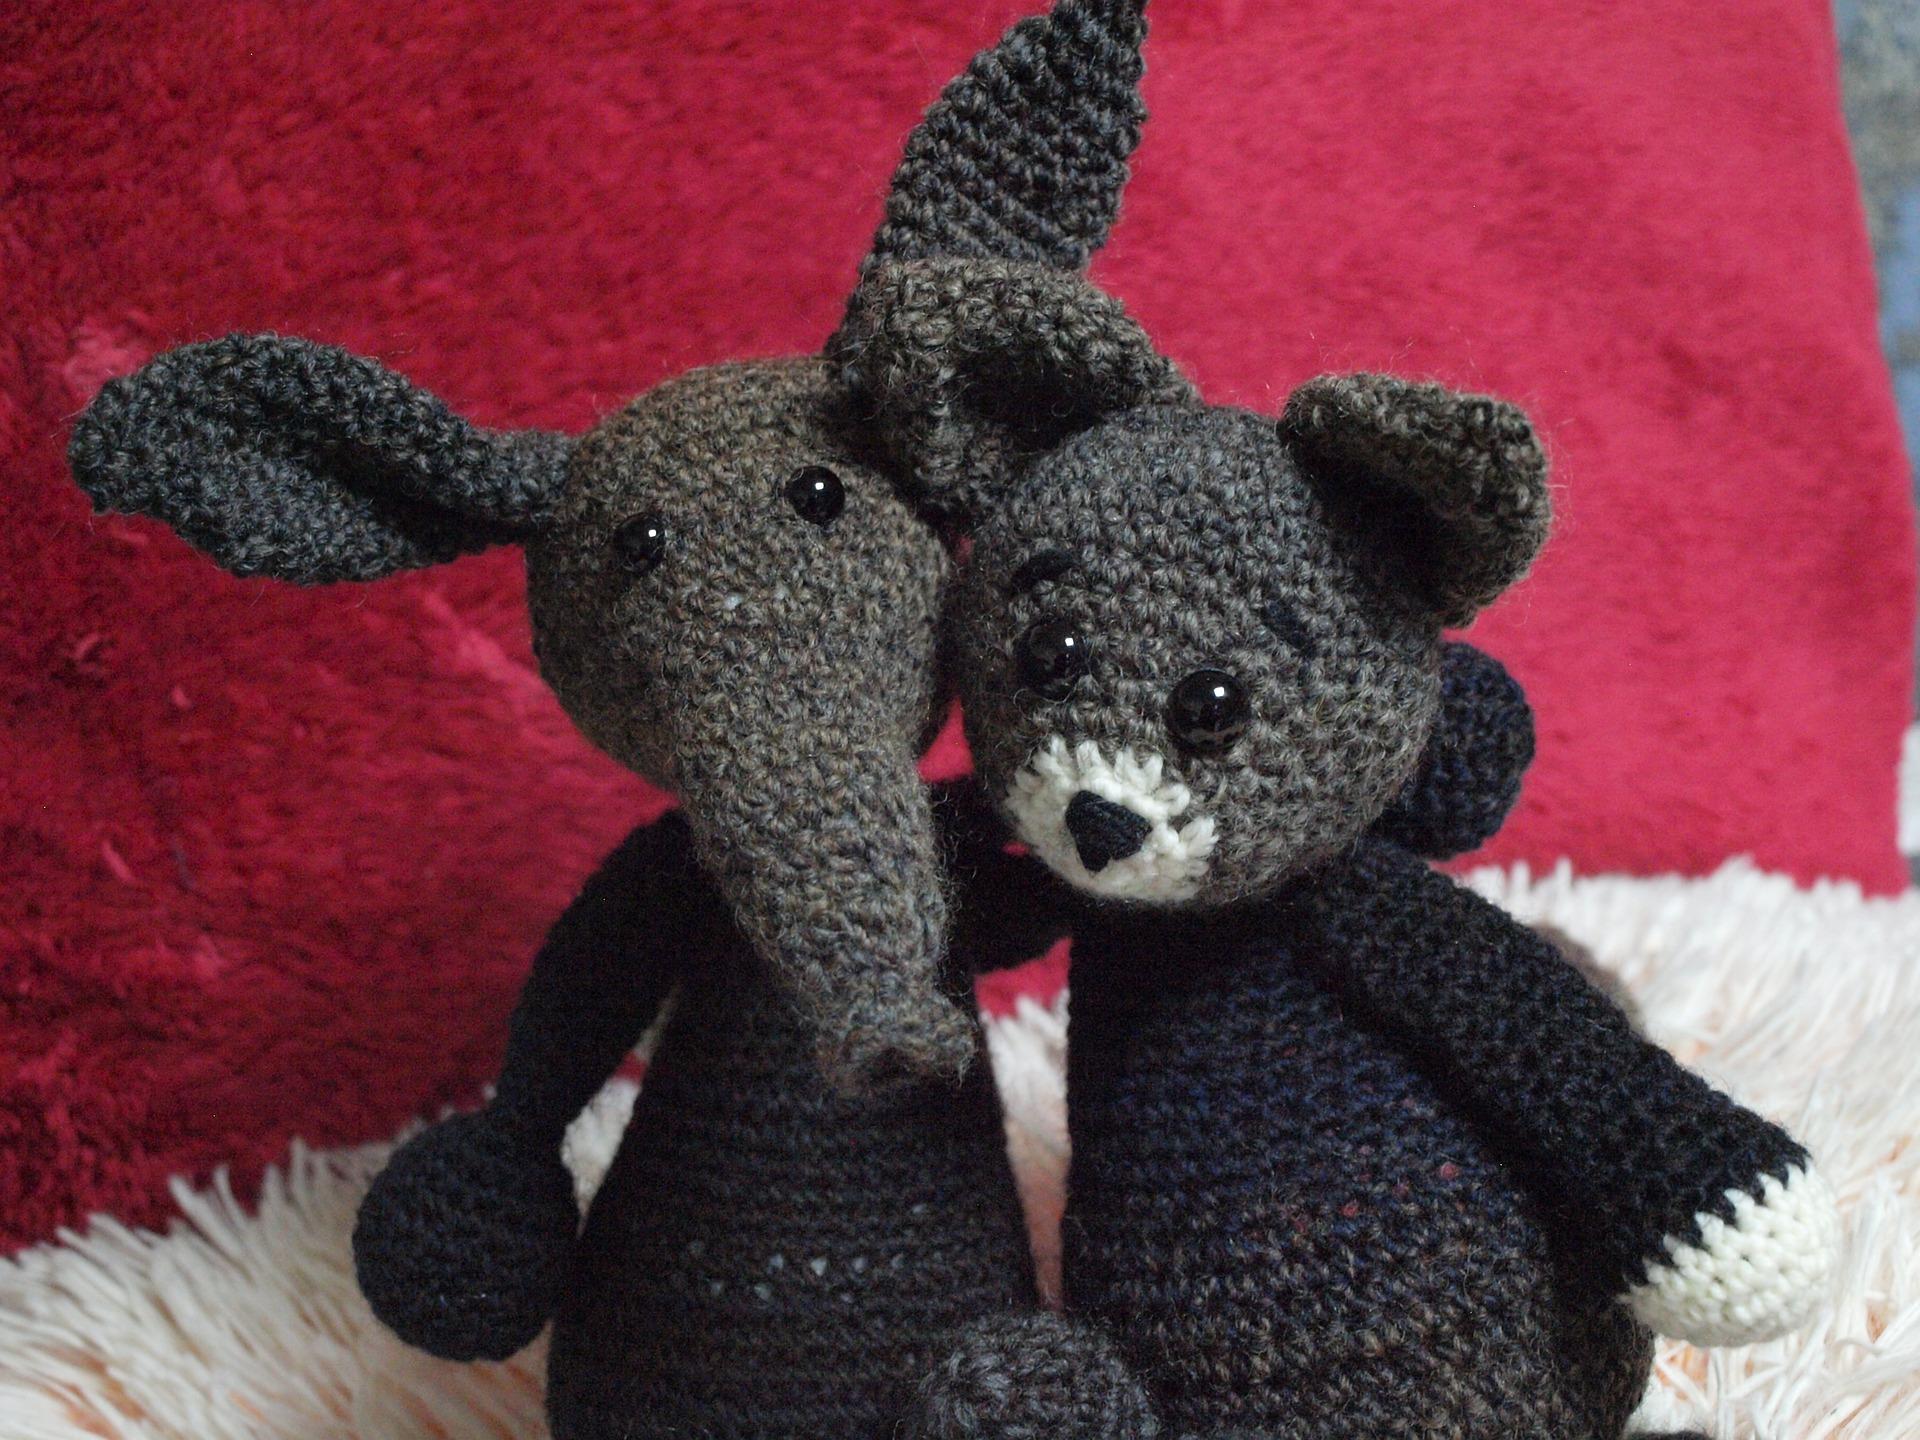 Loisirs créatifs : crocheter des amigurumis